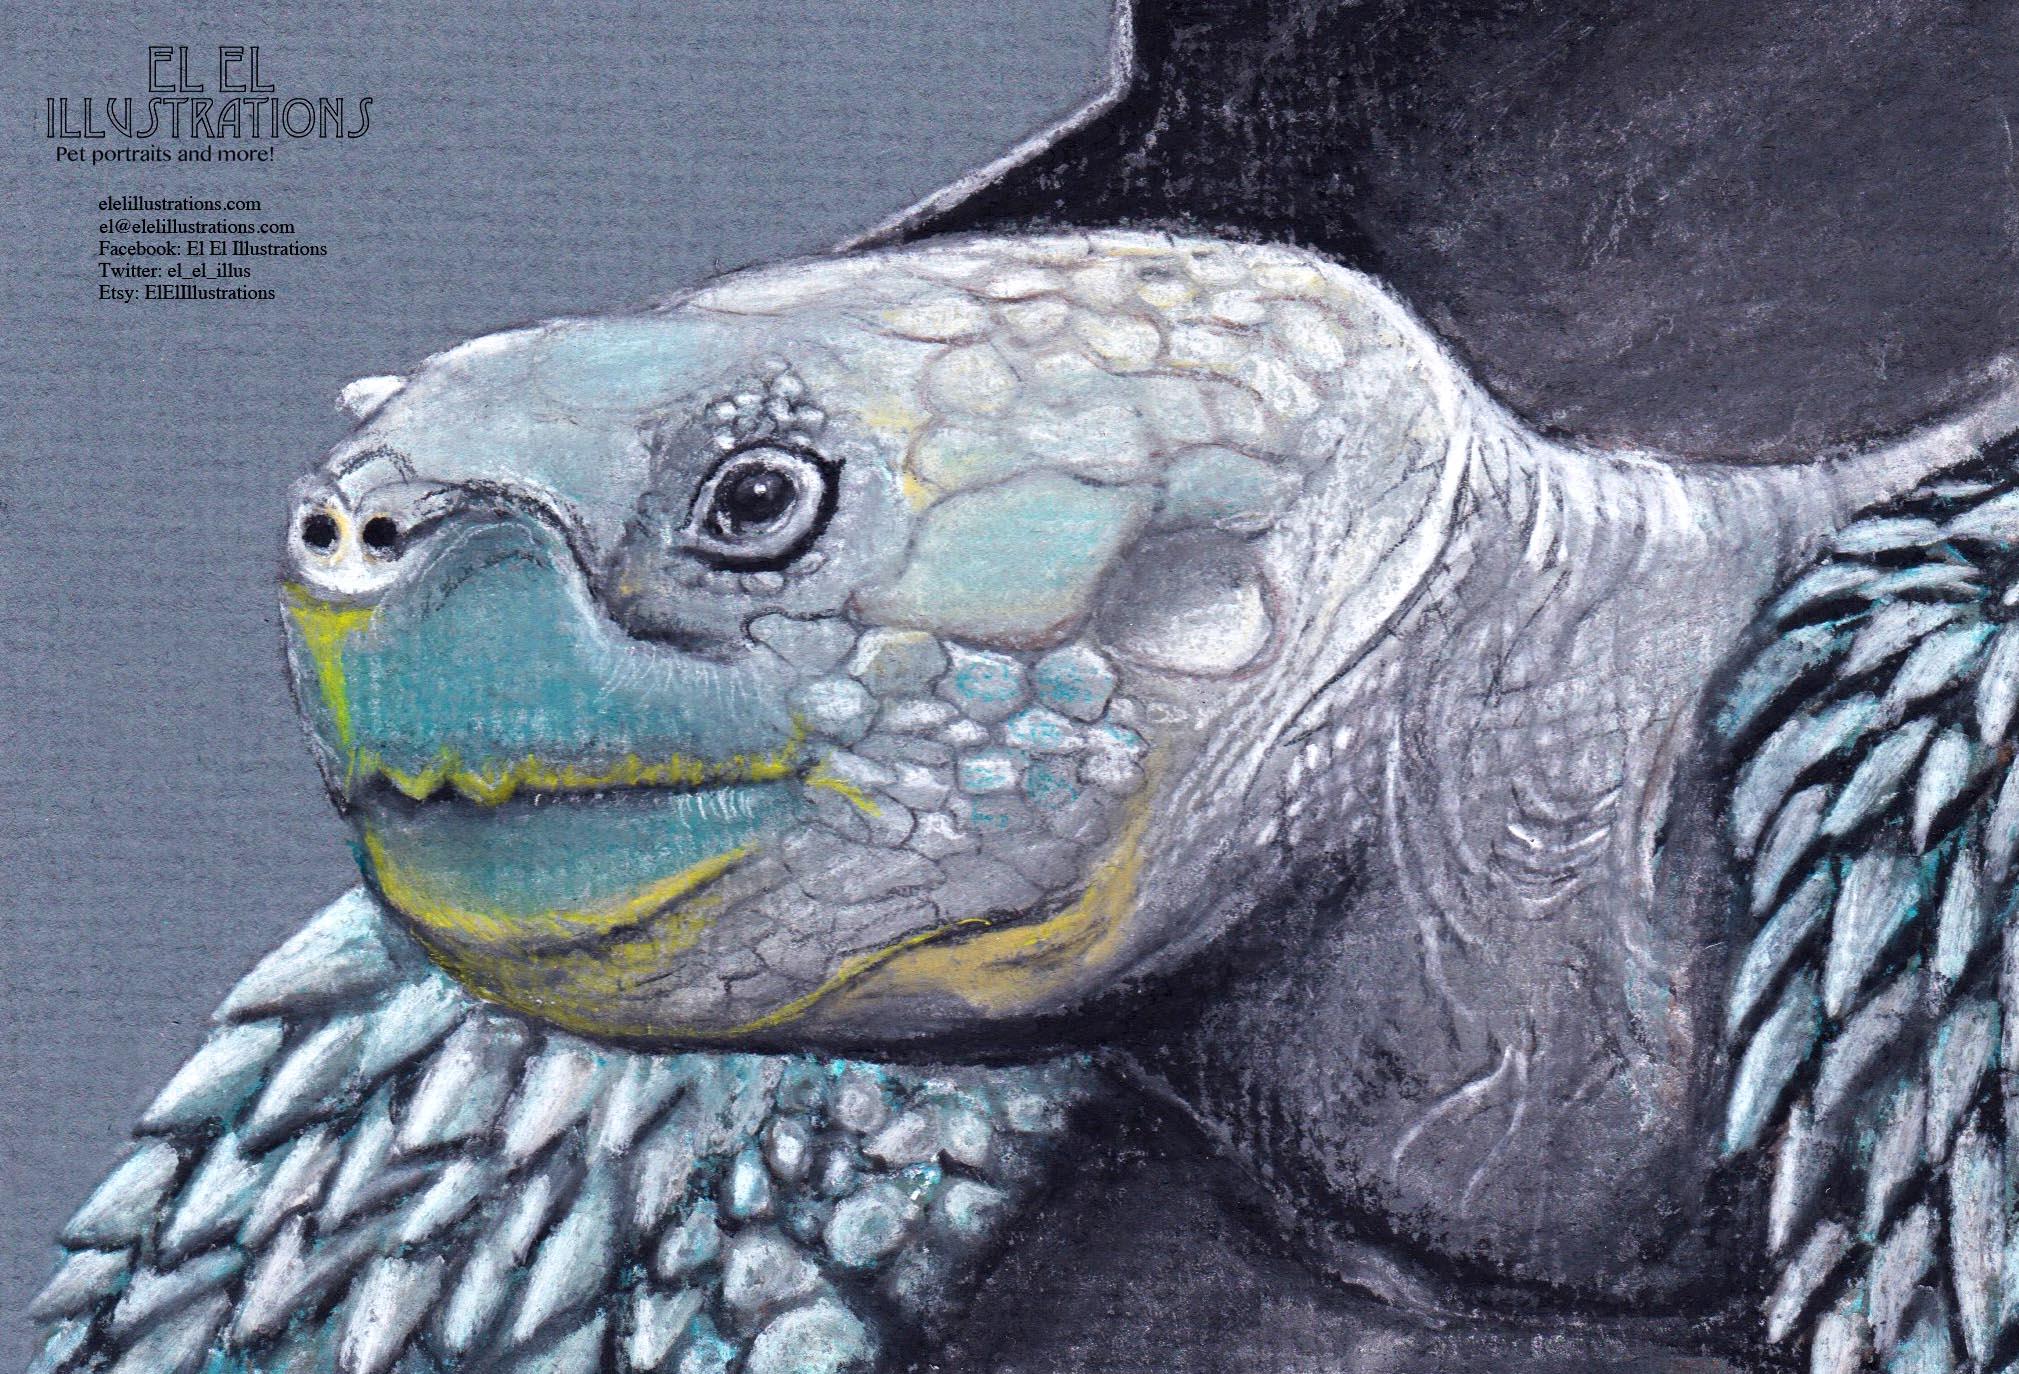 tortoise_wm.jpg